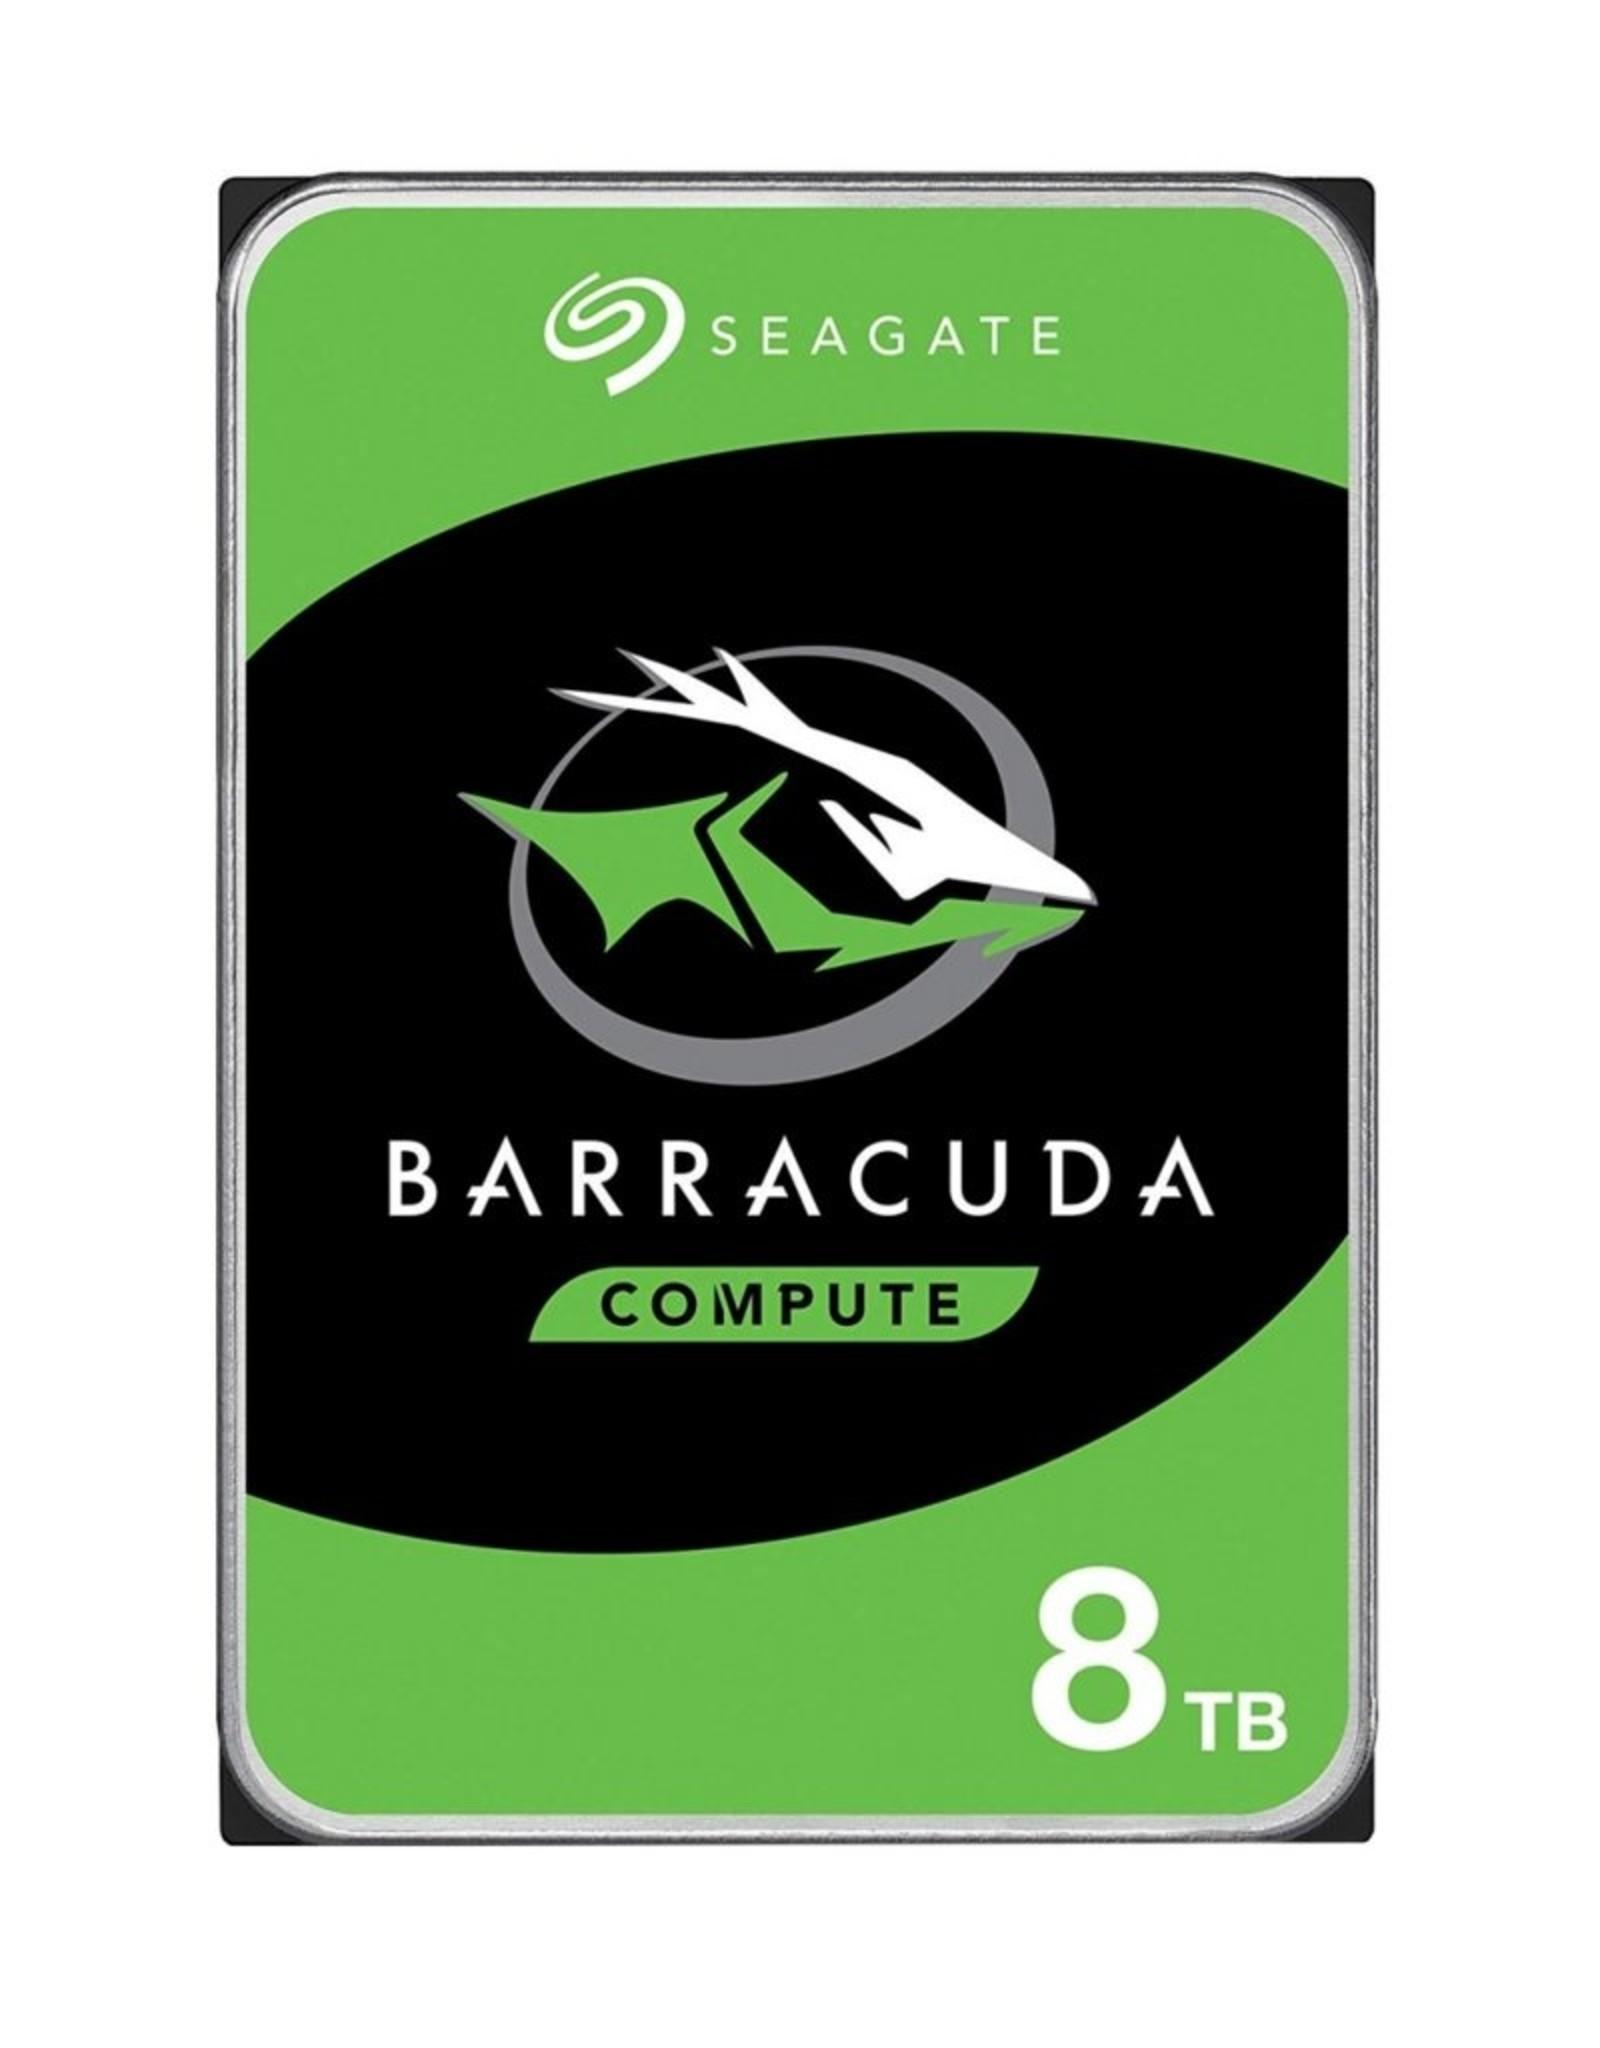 Seagate HDD  Barracuda 8TB - 3.5inch - 5400RPM